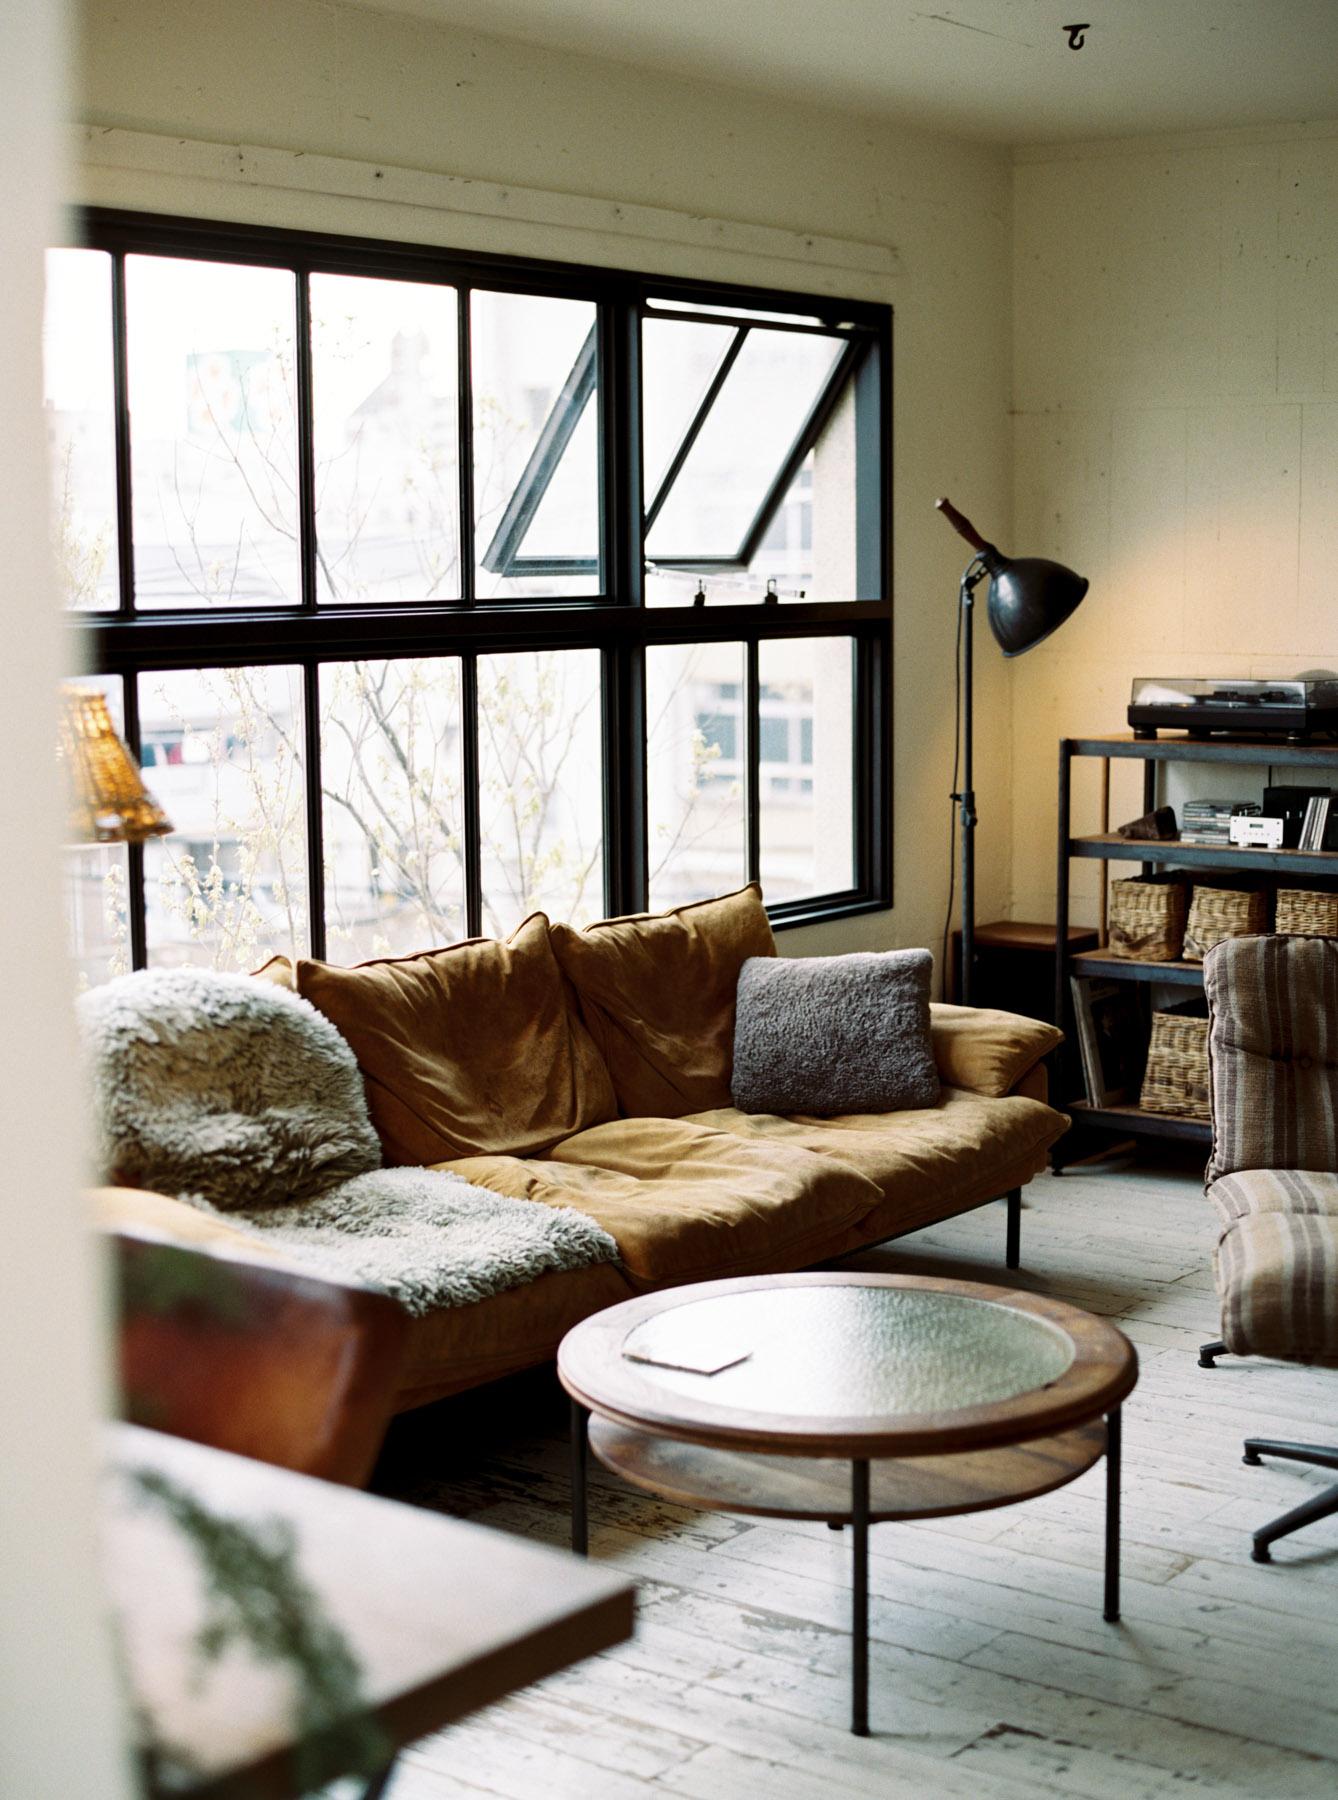 Tokuhiko Kise, Truck Furniture, Osaka, Japan, Kodak, Justin Chung